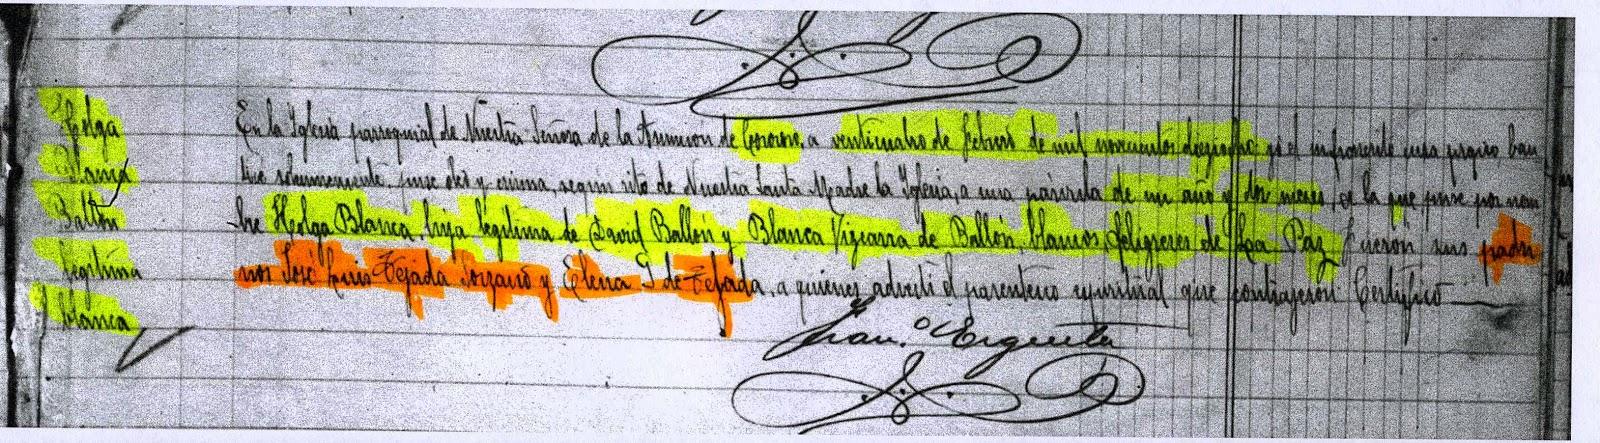 Genealog a en bolivia ballon mi apellido paterno for Cementerio jardin la paz bolivia